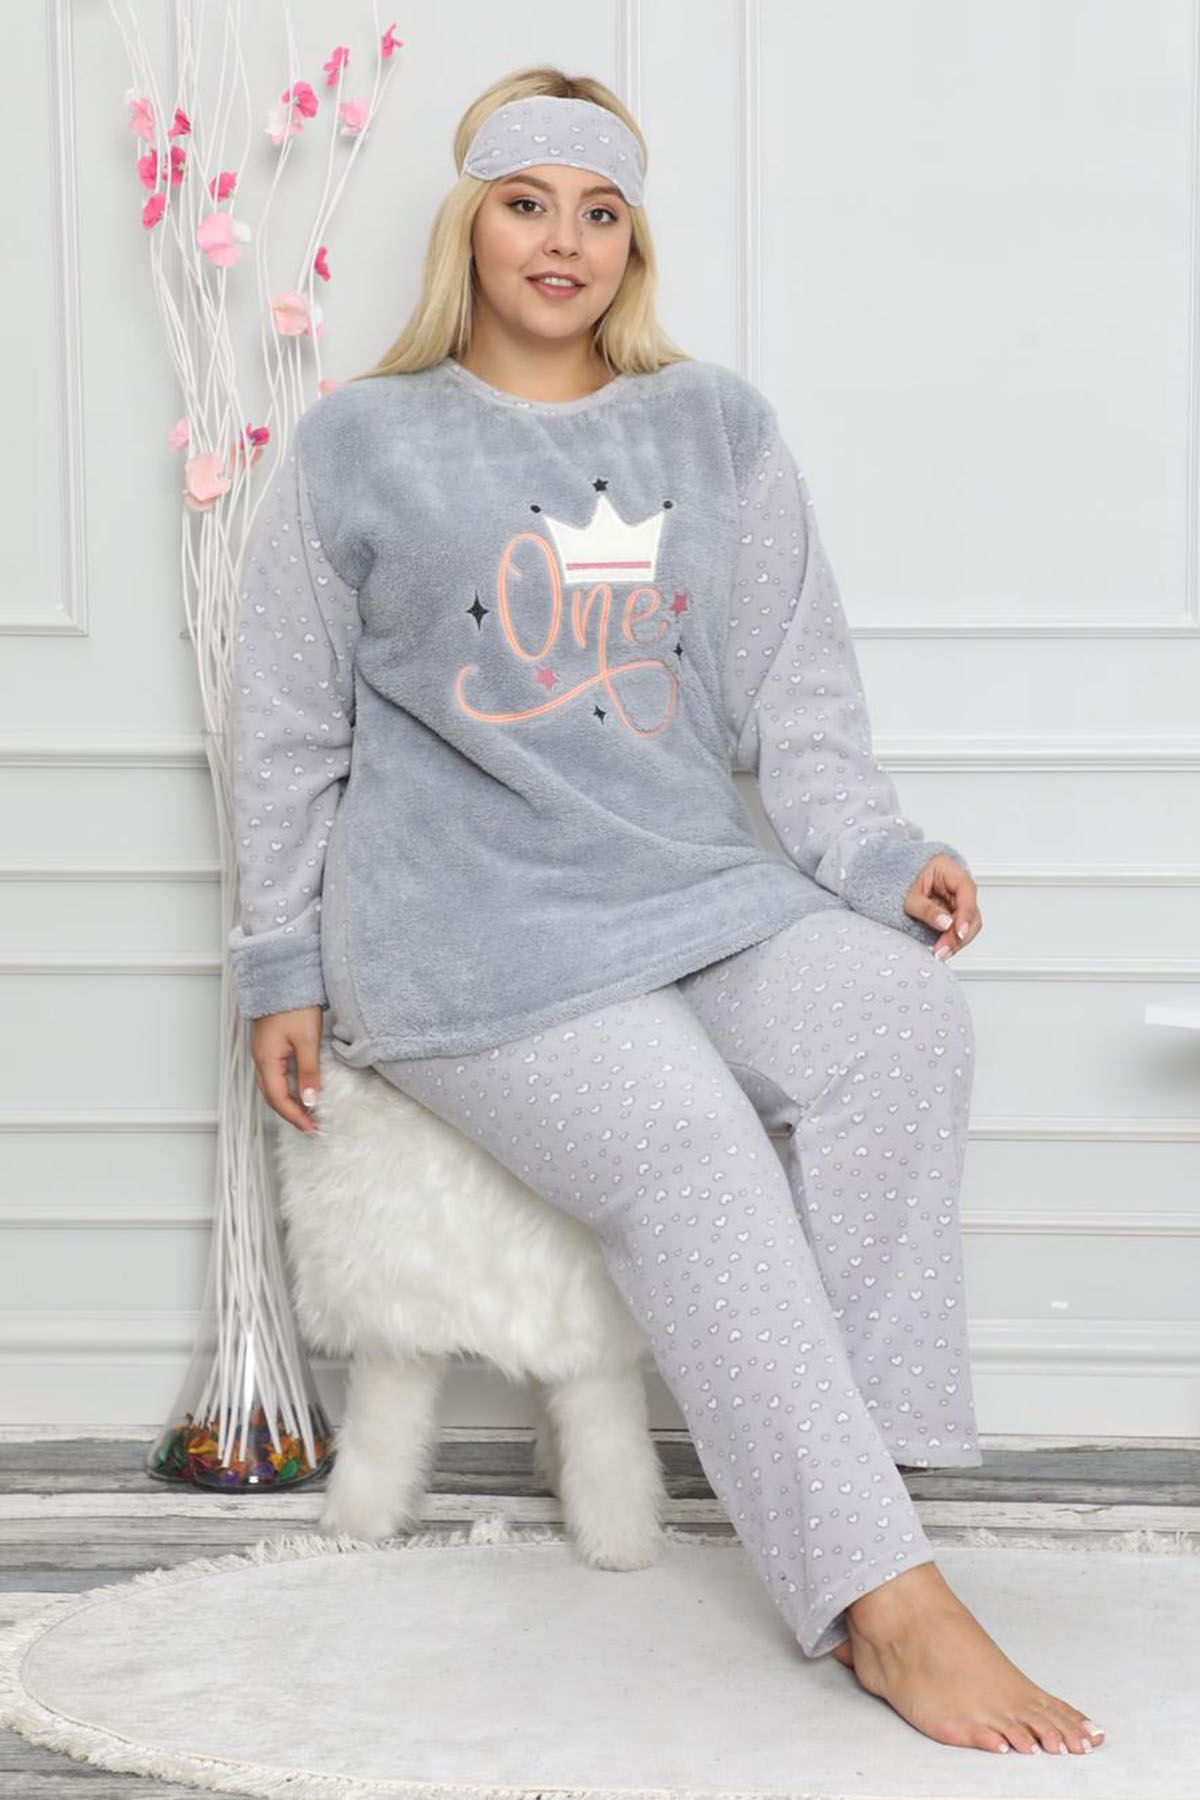 Welsoft Kİng Pijama Takımı 32E-59057G